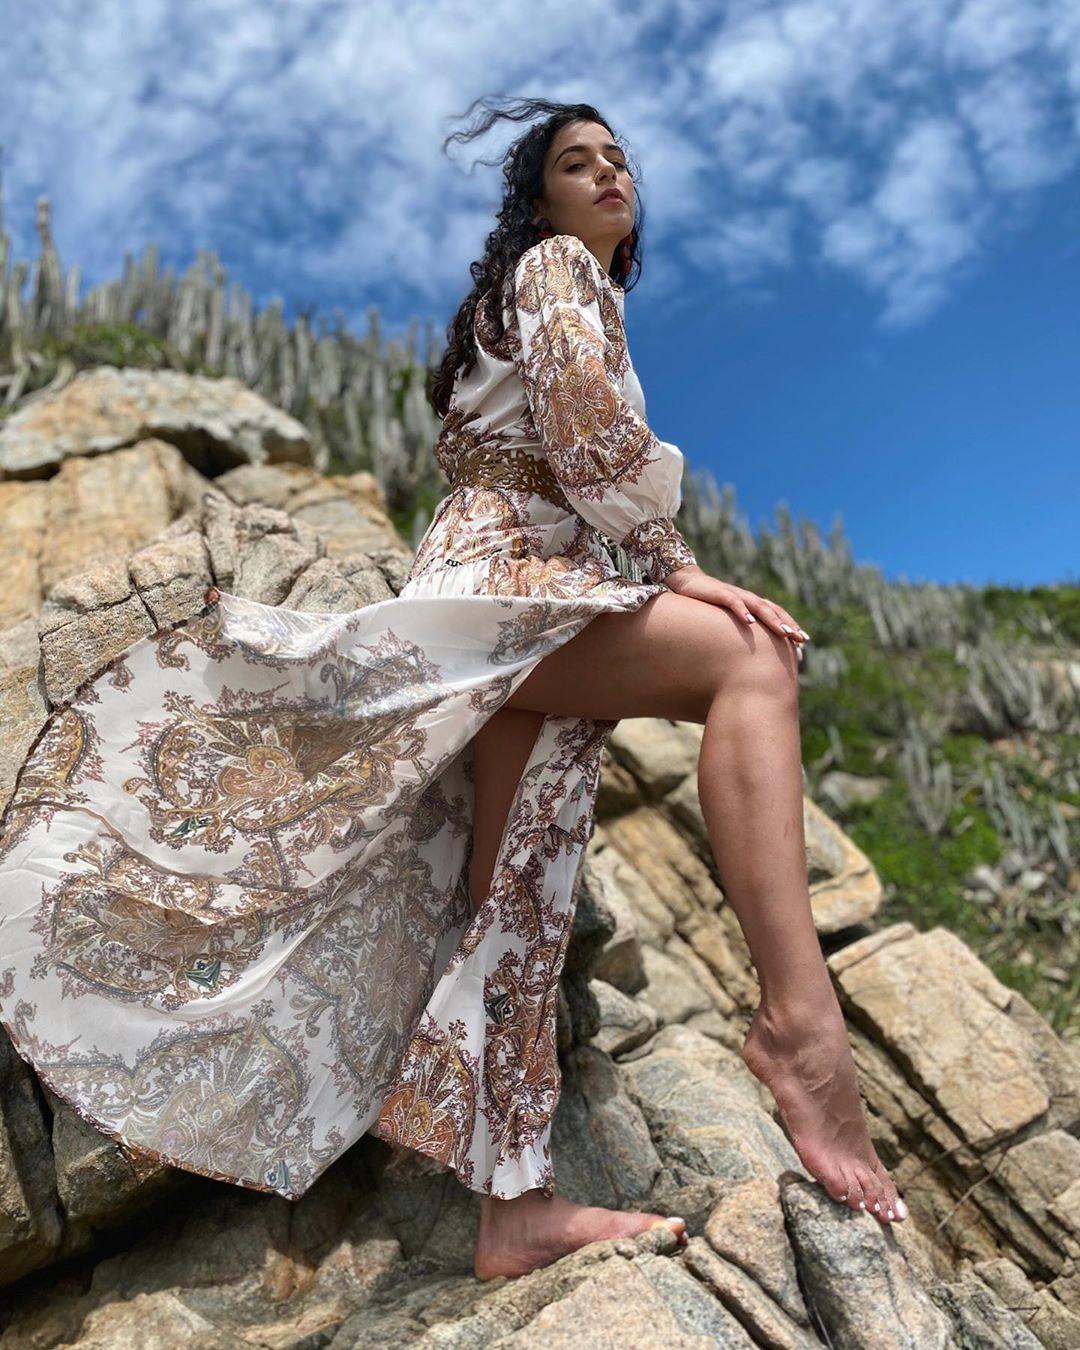 julia gama, miss brasil universo 2020/top 11 de miss world 2014. - Página 3 10114710